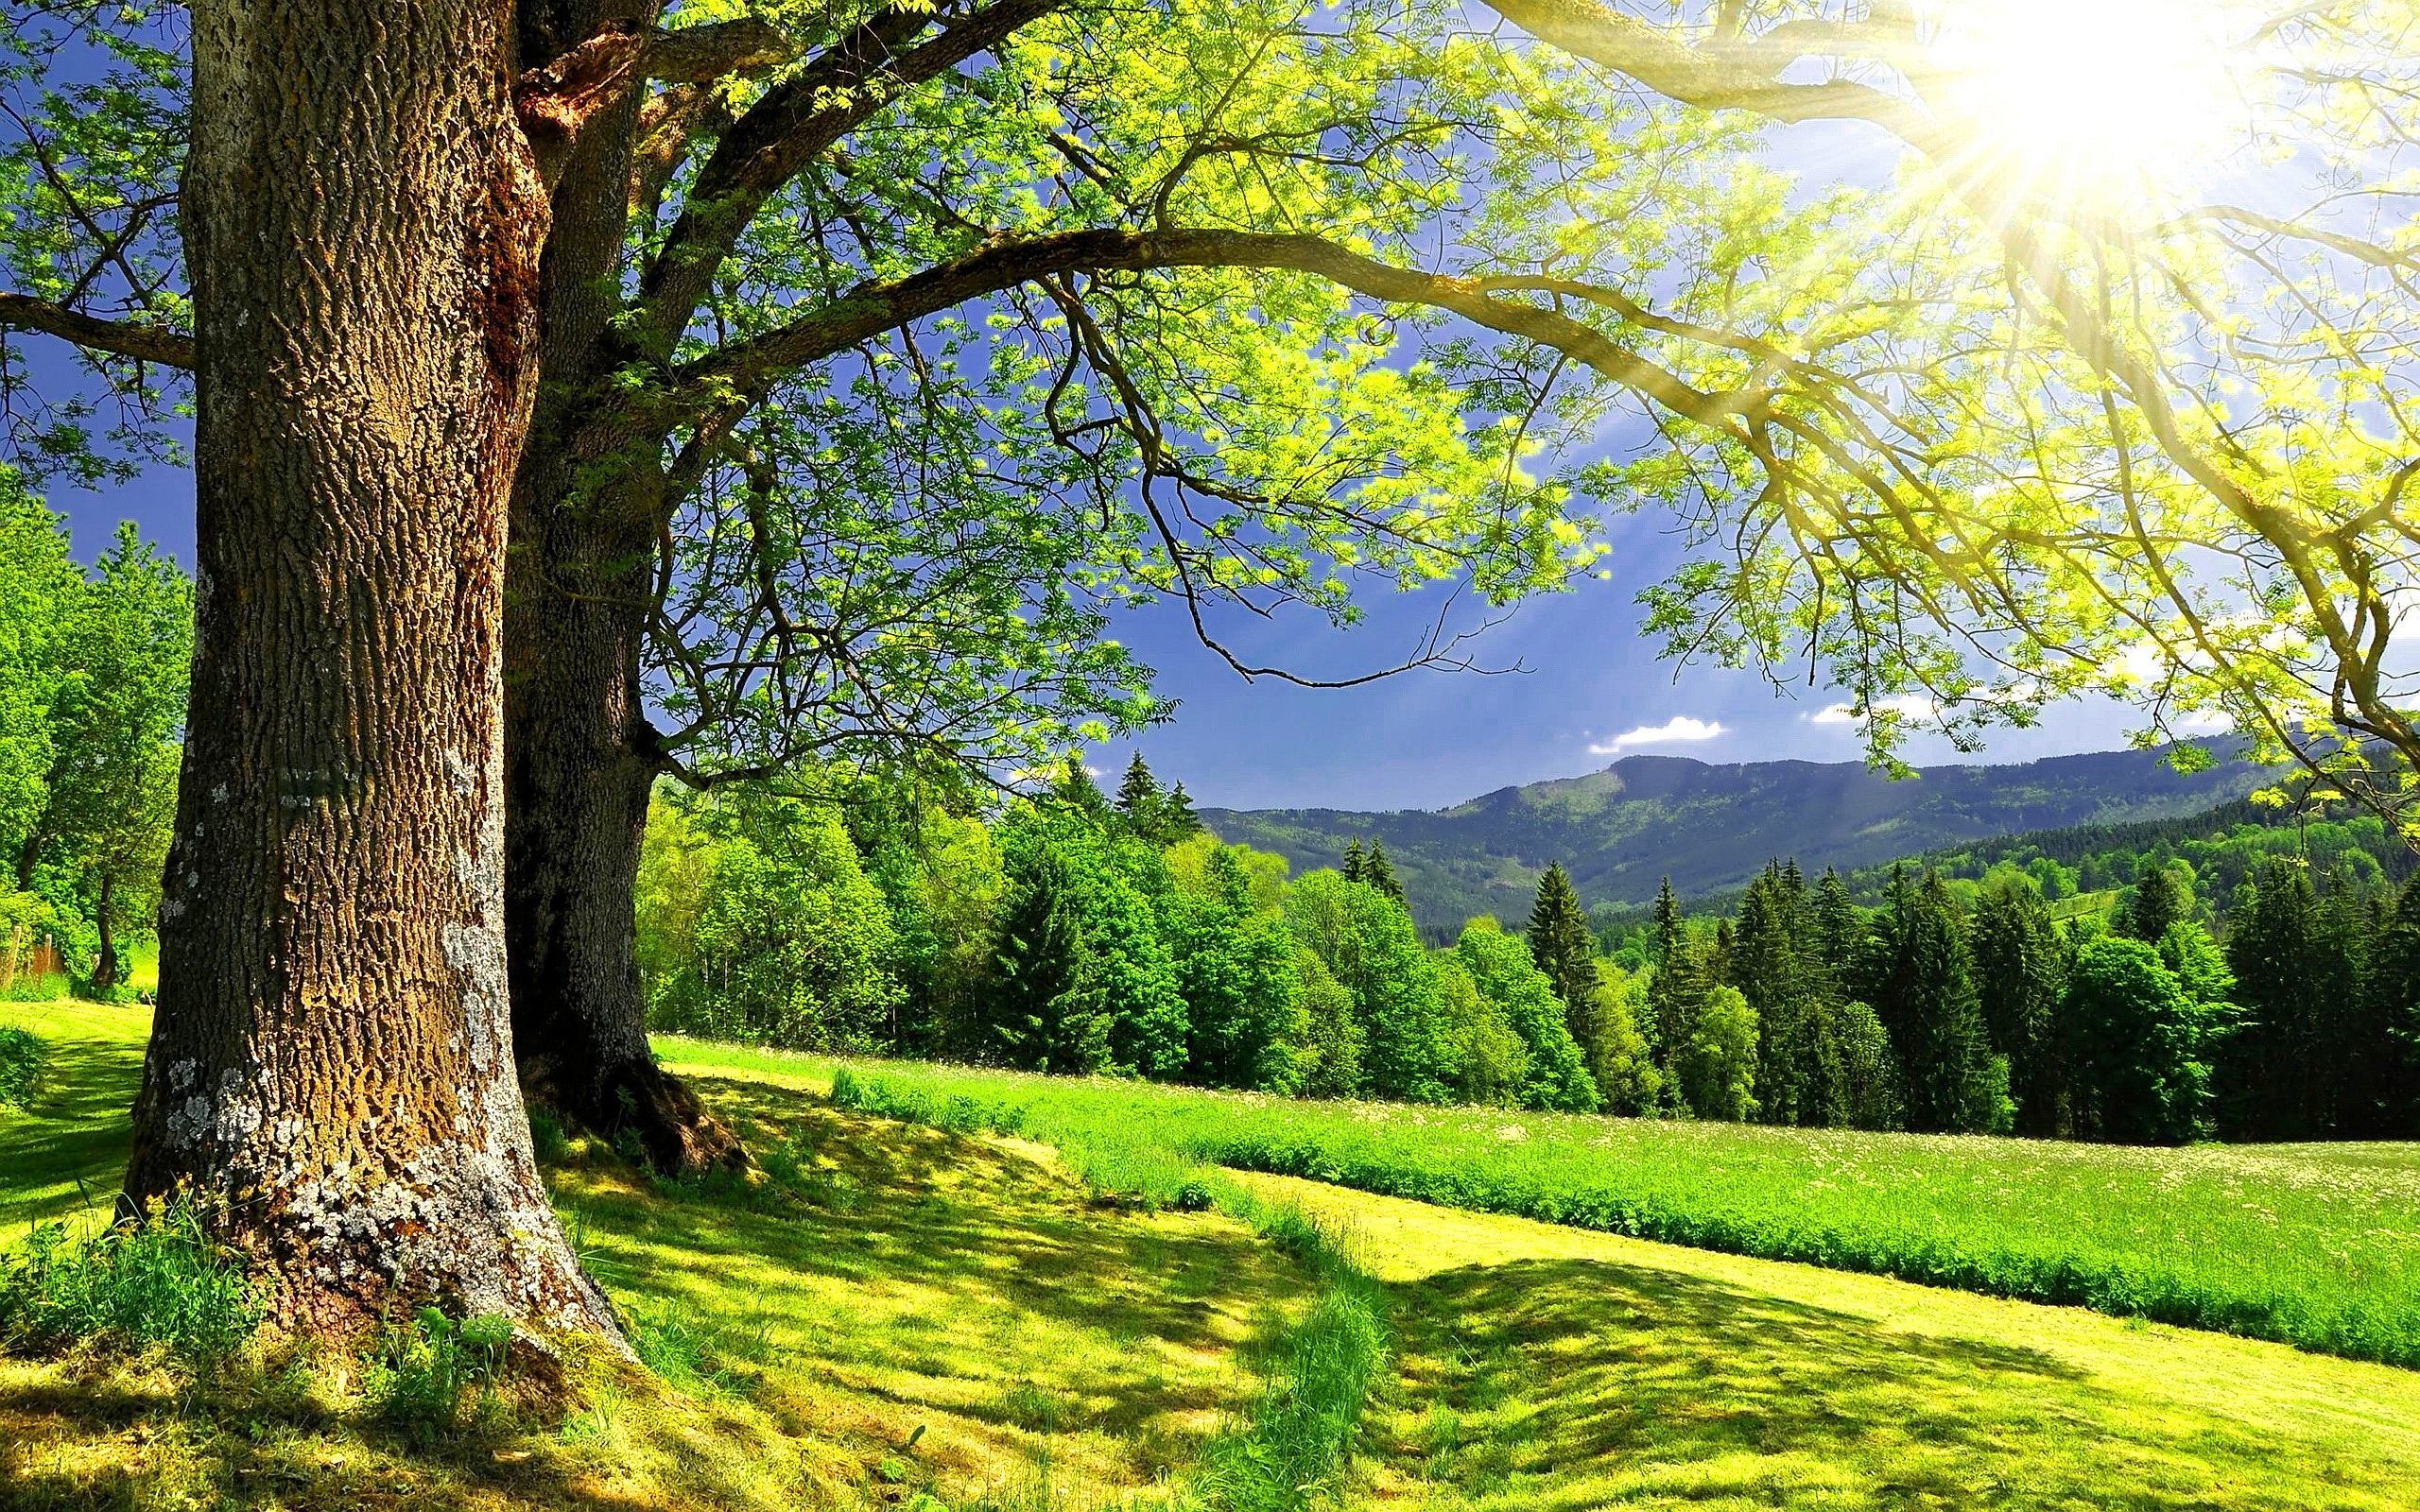 Sunny Summer Day wallpaper 2560x1600 32063 2560x1600